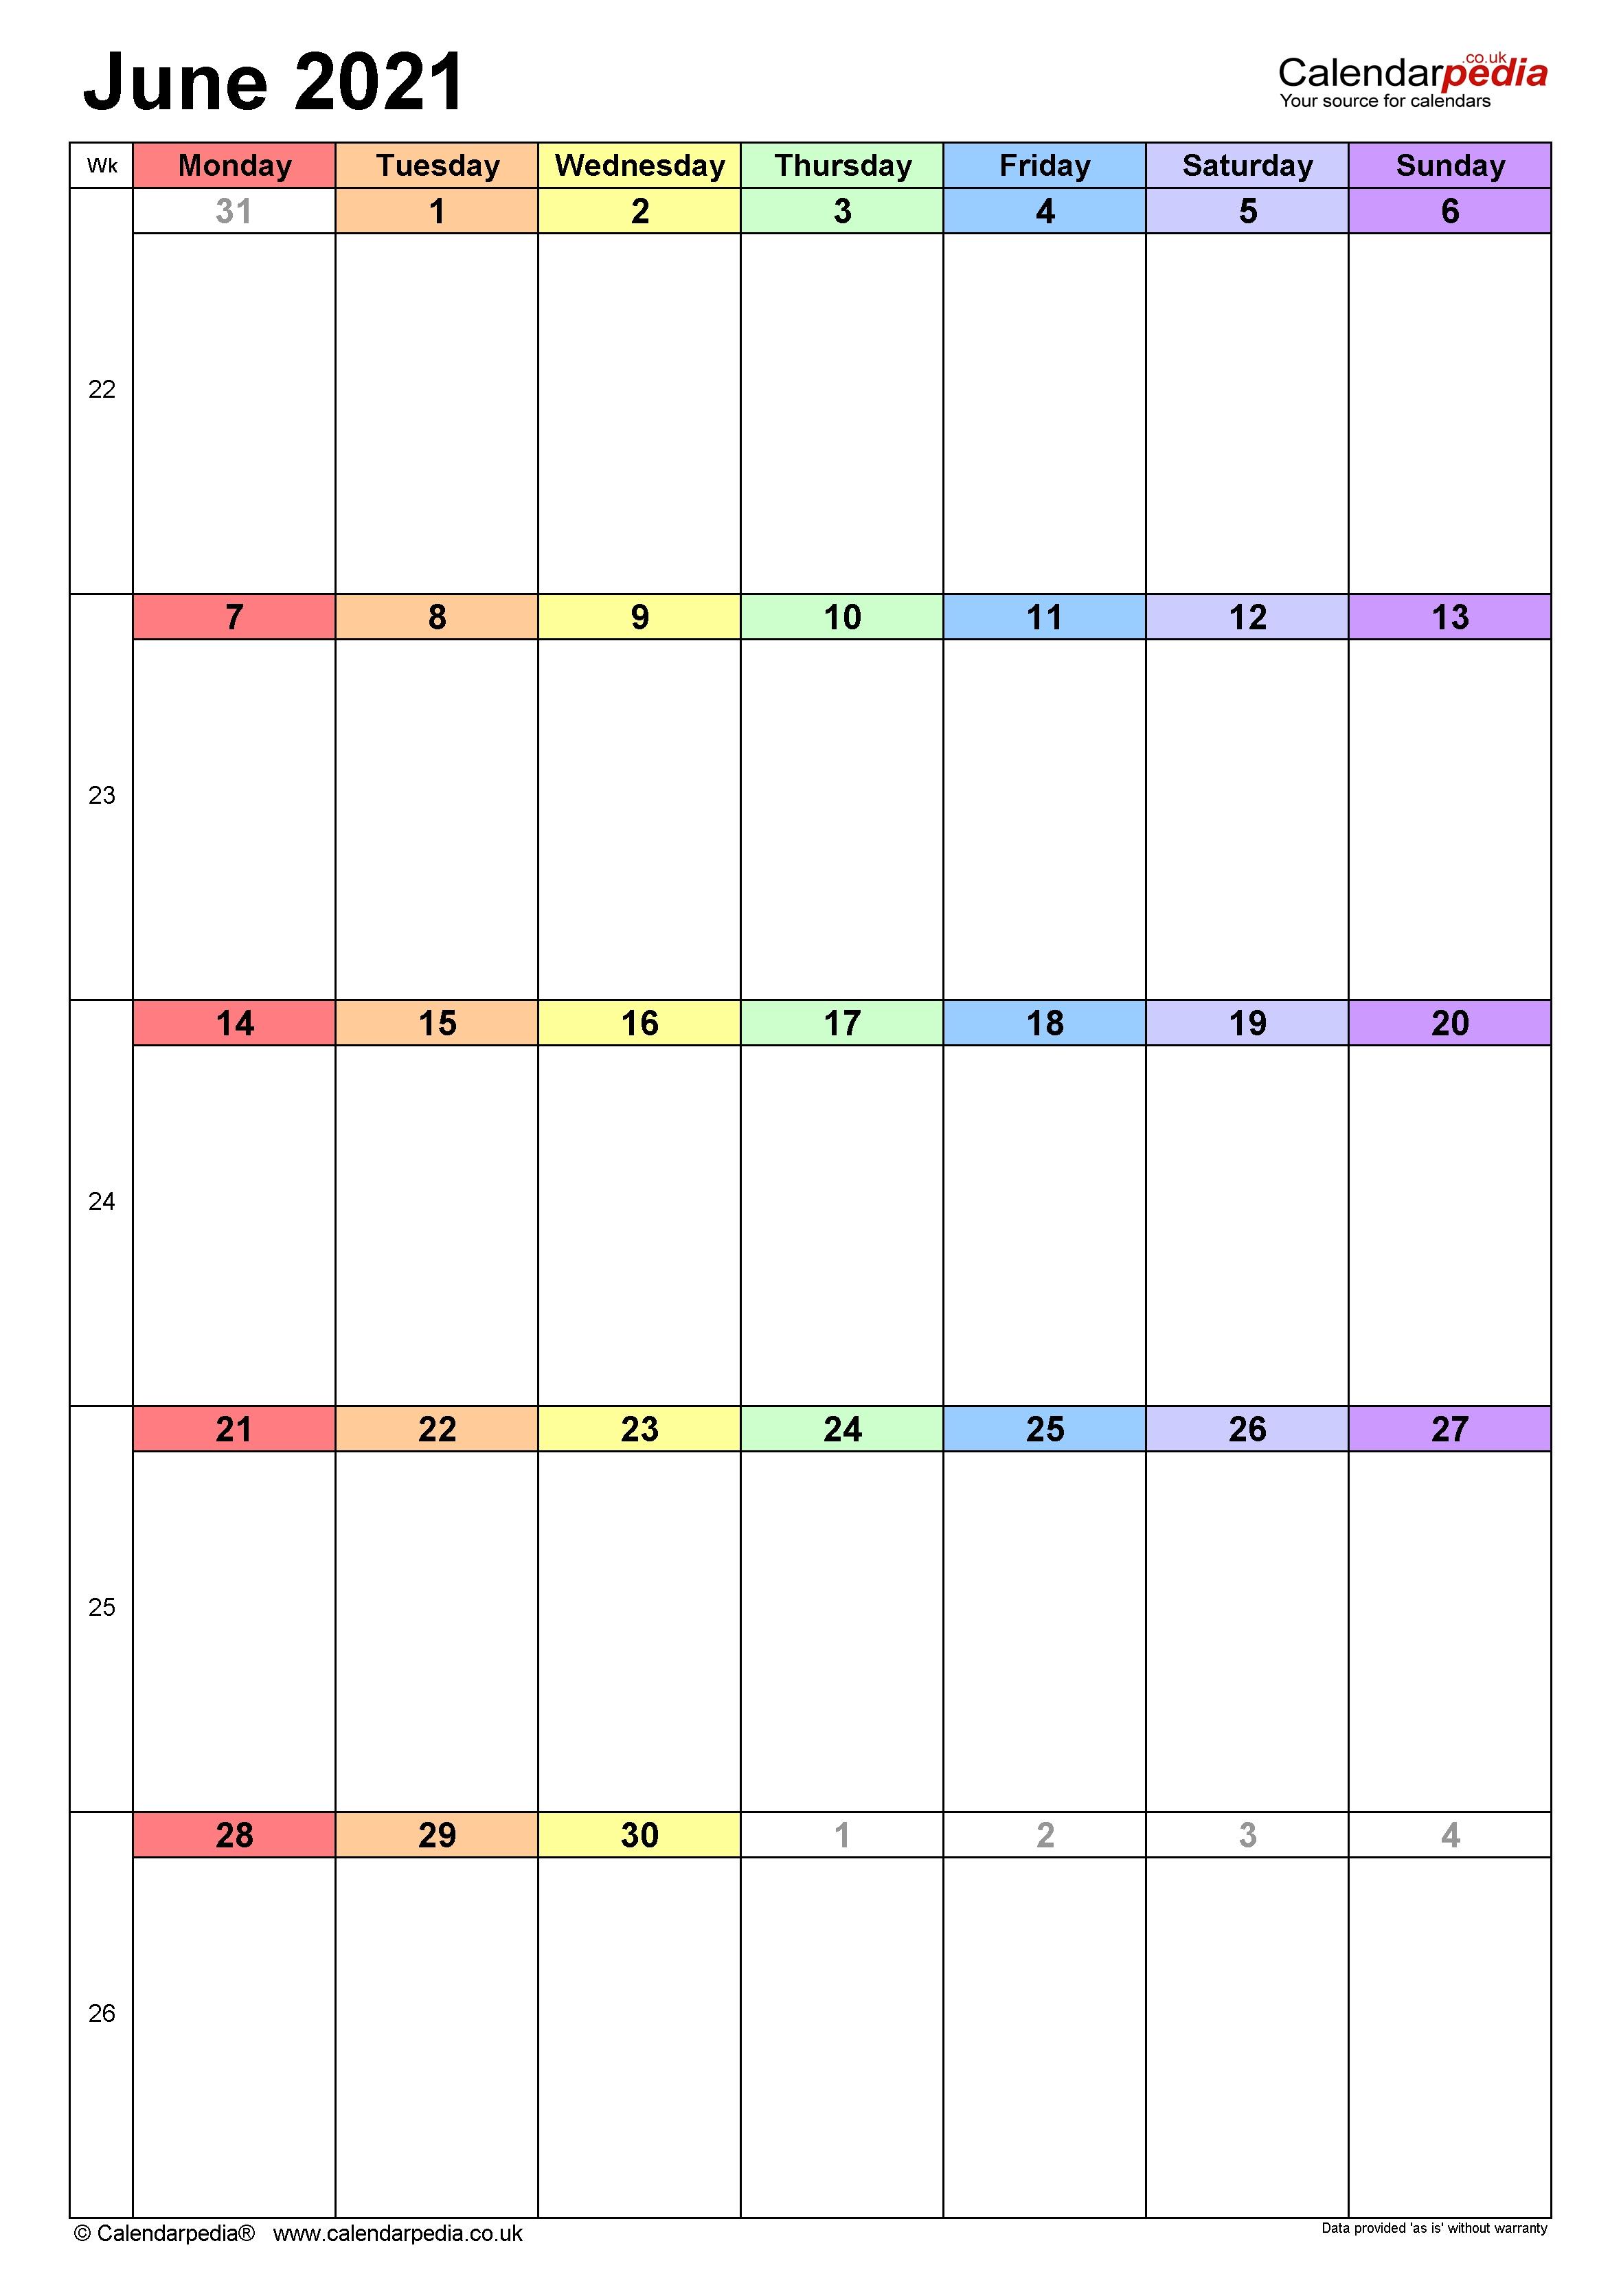 Calendar June 2021 Uk With Excel, Word And Pdf Templates June 2021 Calendar Printable